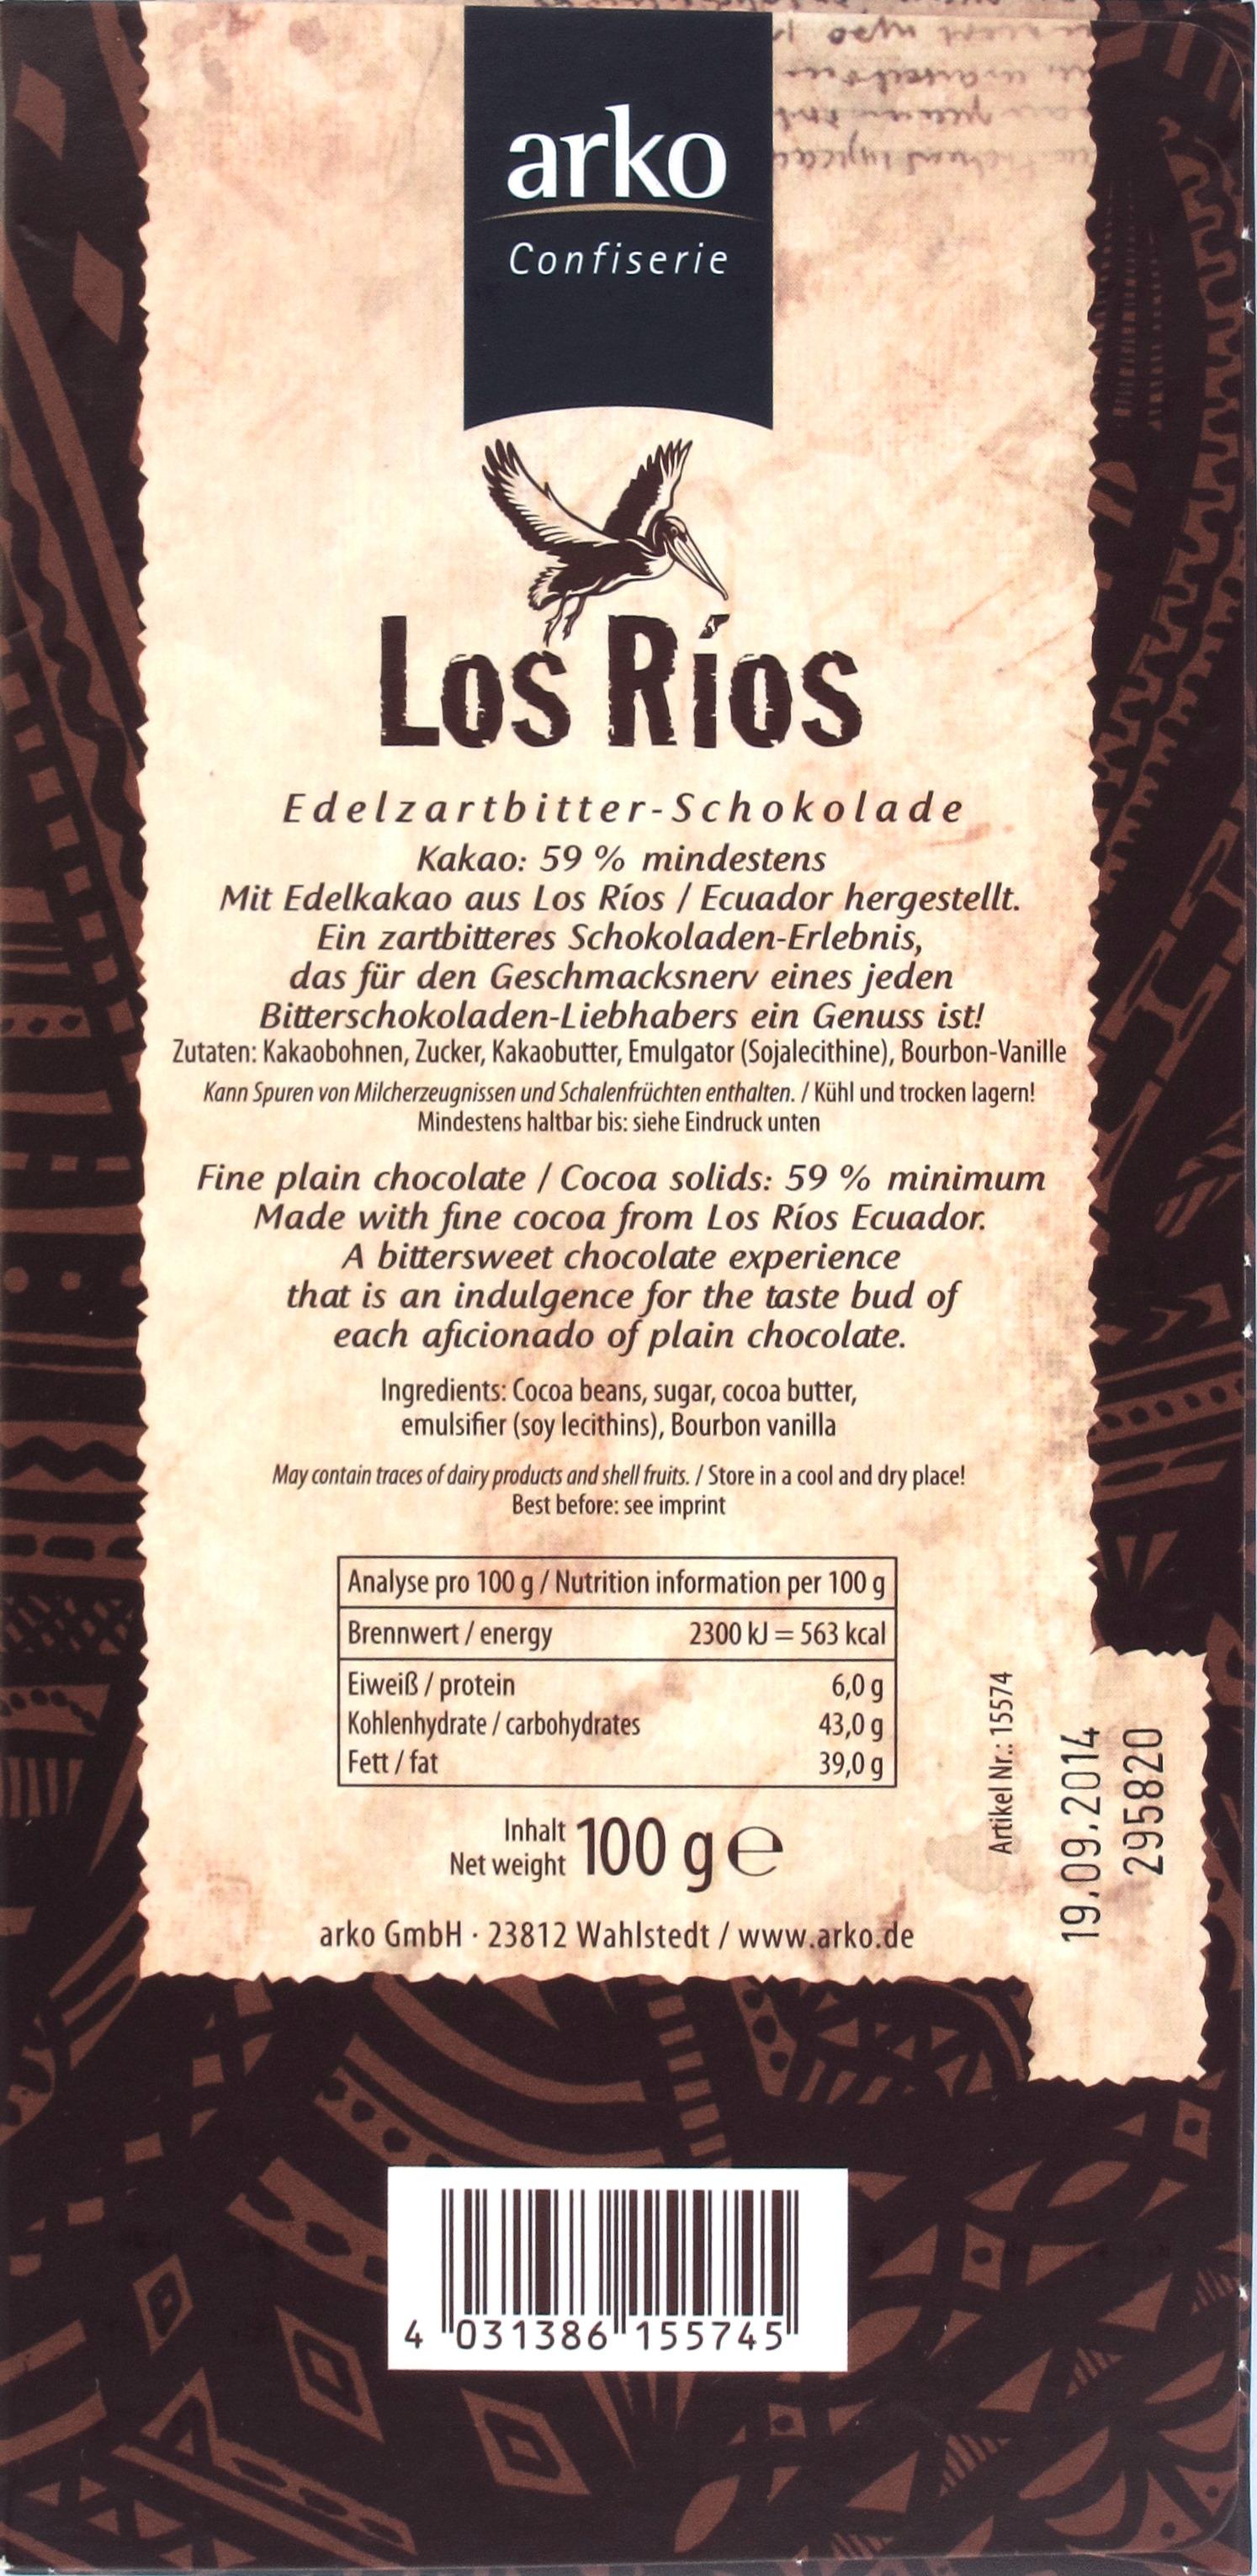 Inhaltsangaben: Arko Los Ríos